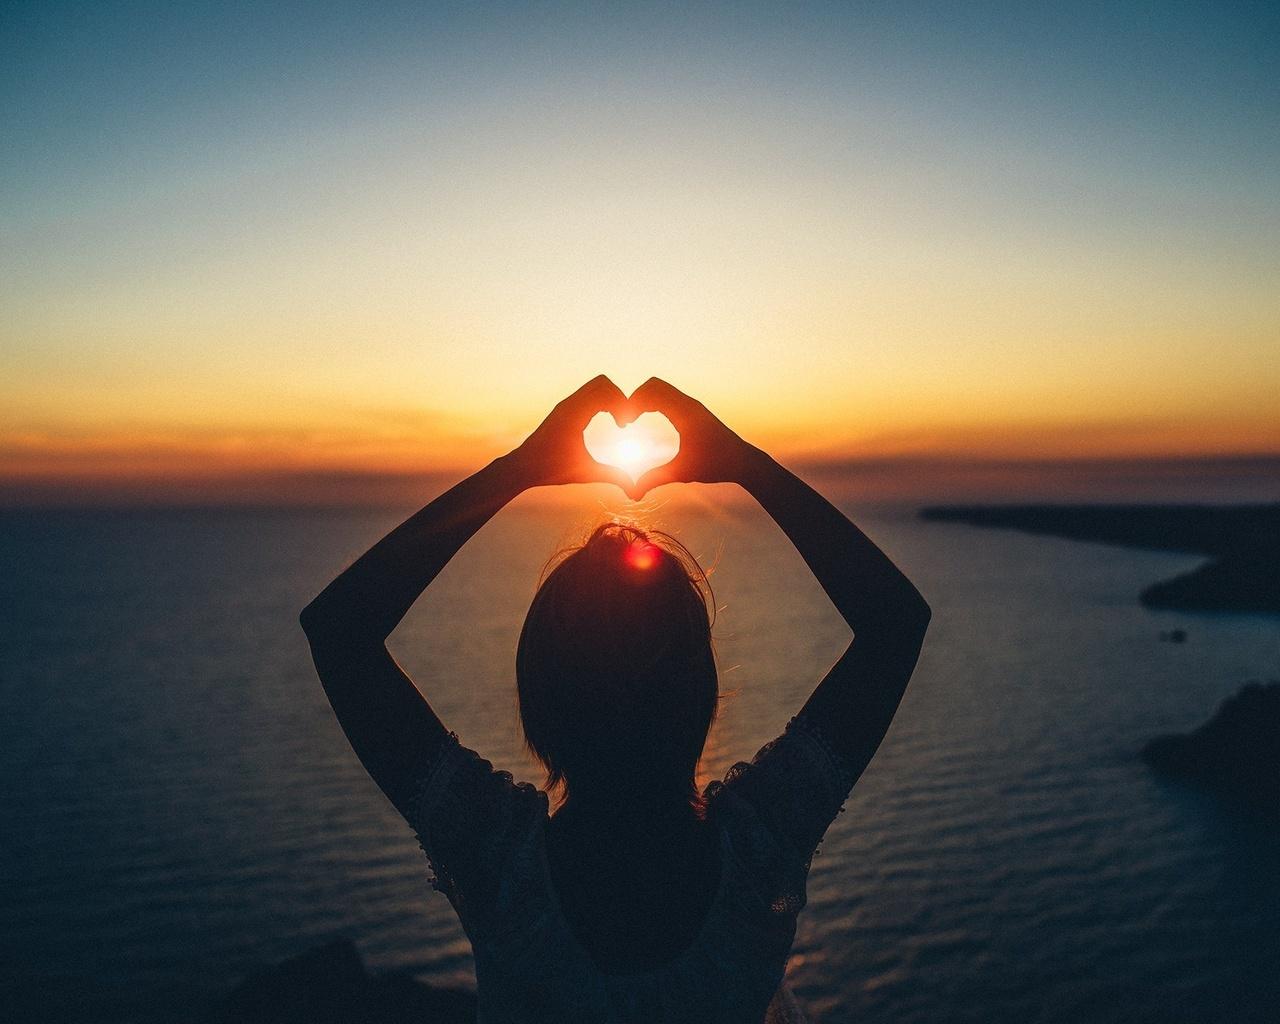 картинки красивый закат солнца в руках опаздывал концу